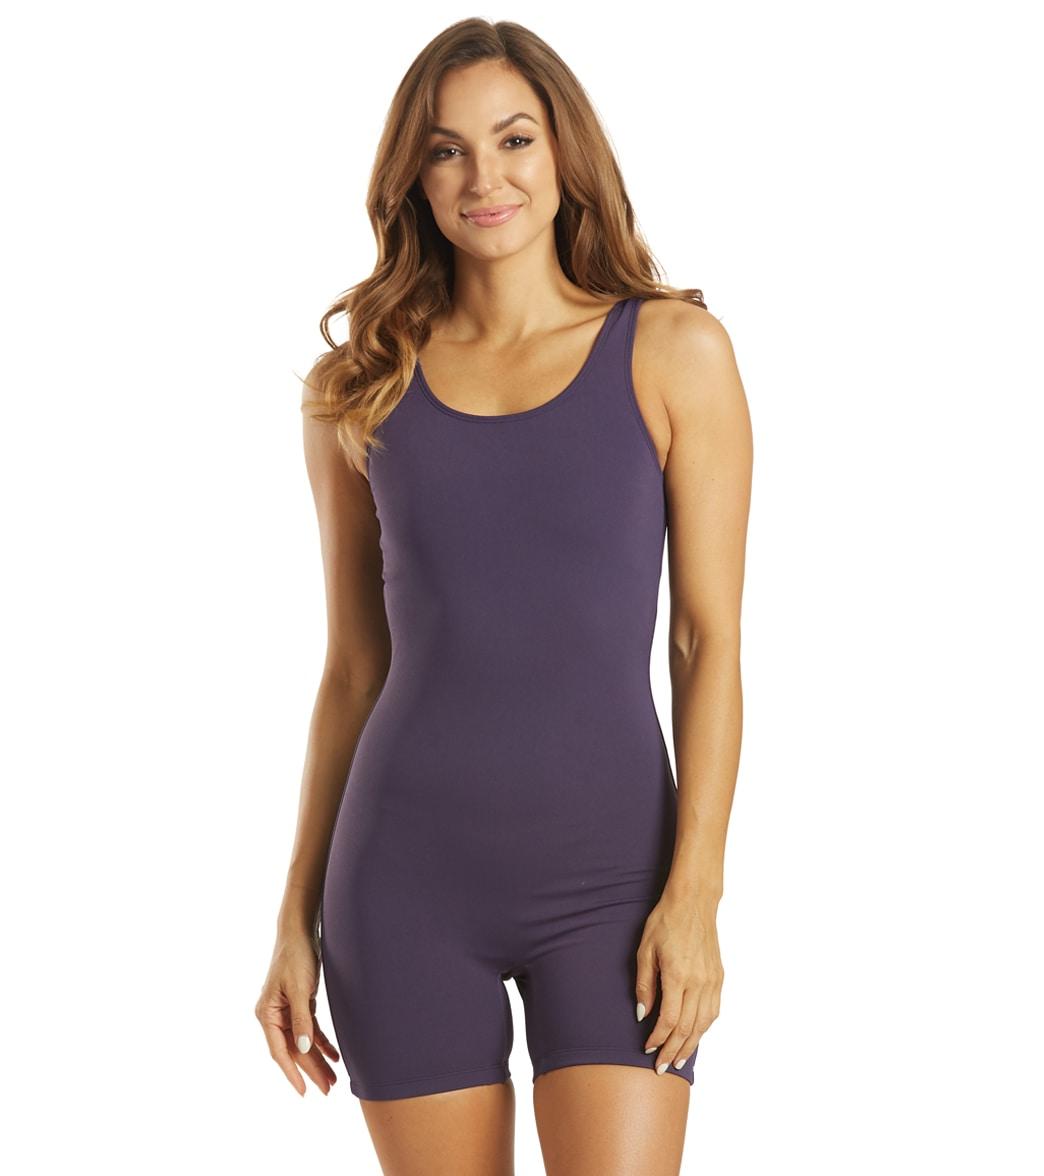 Sporti Lia Chlorine Resistant Scoop Back Unitard One Piece Swimsuit